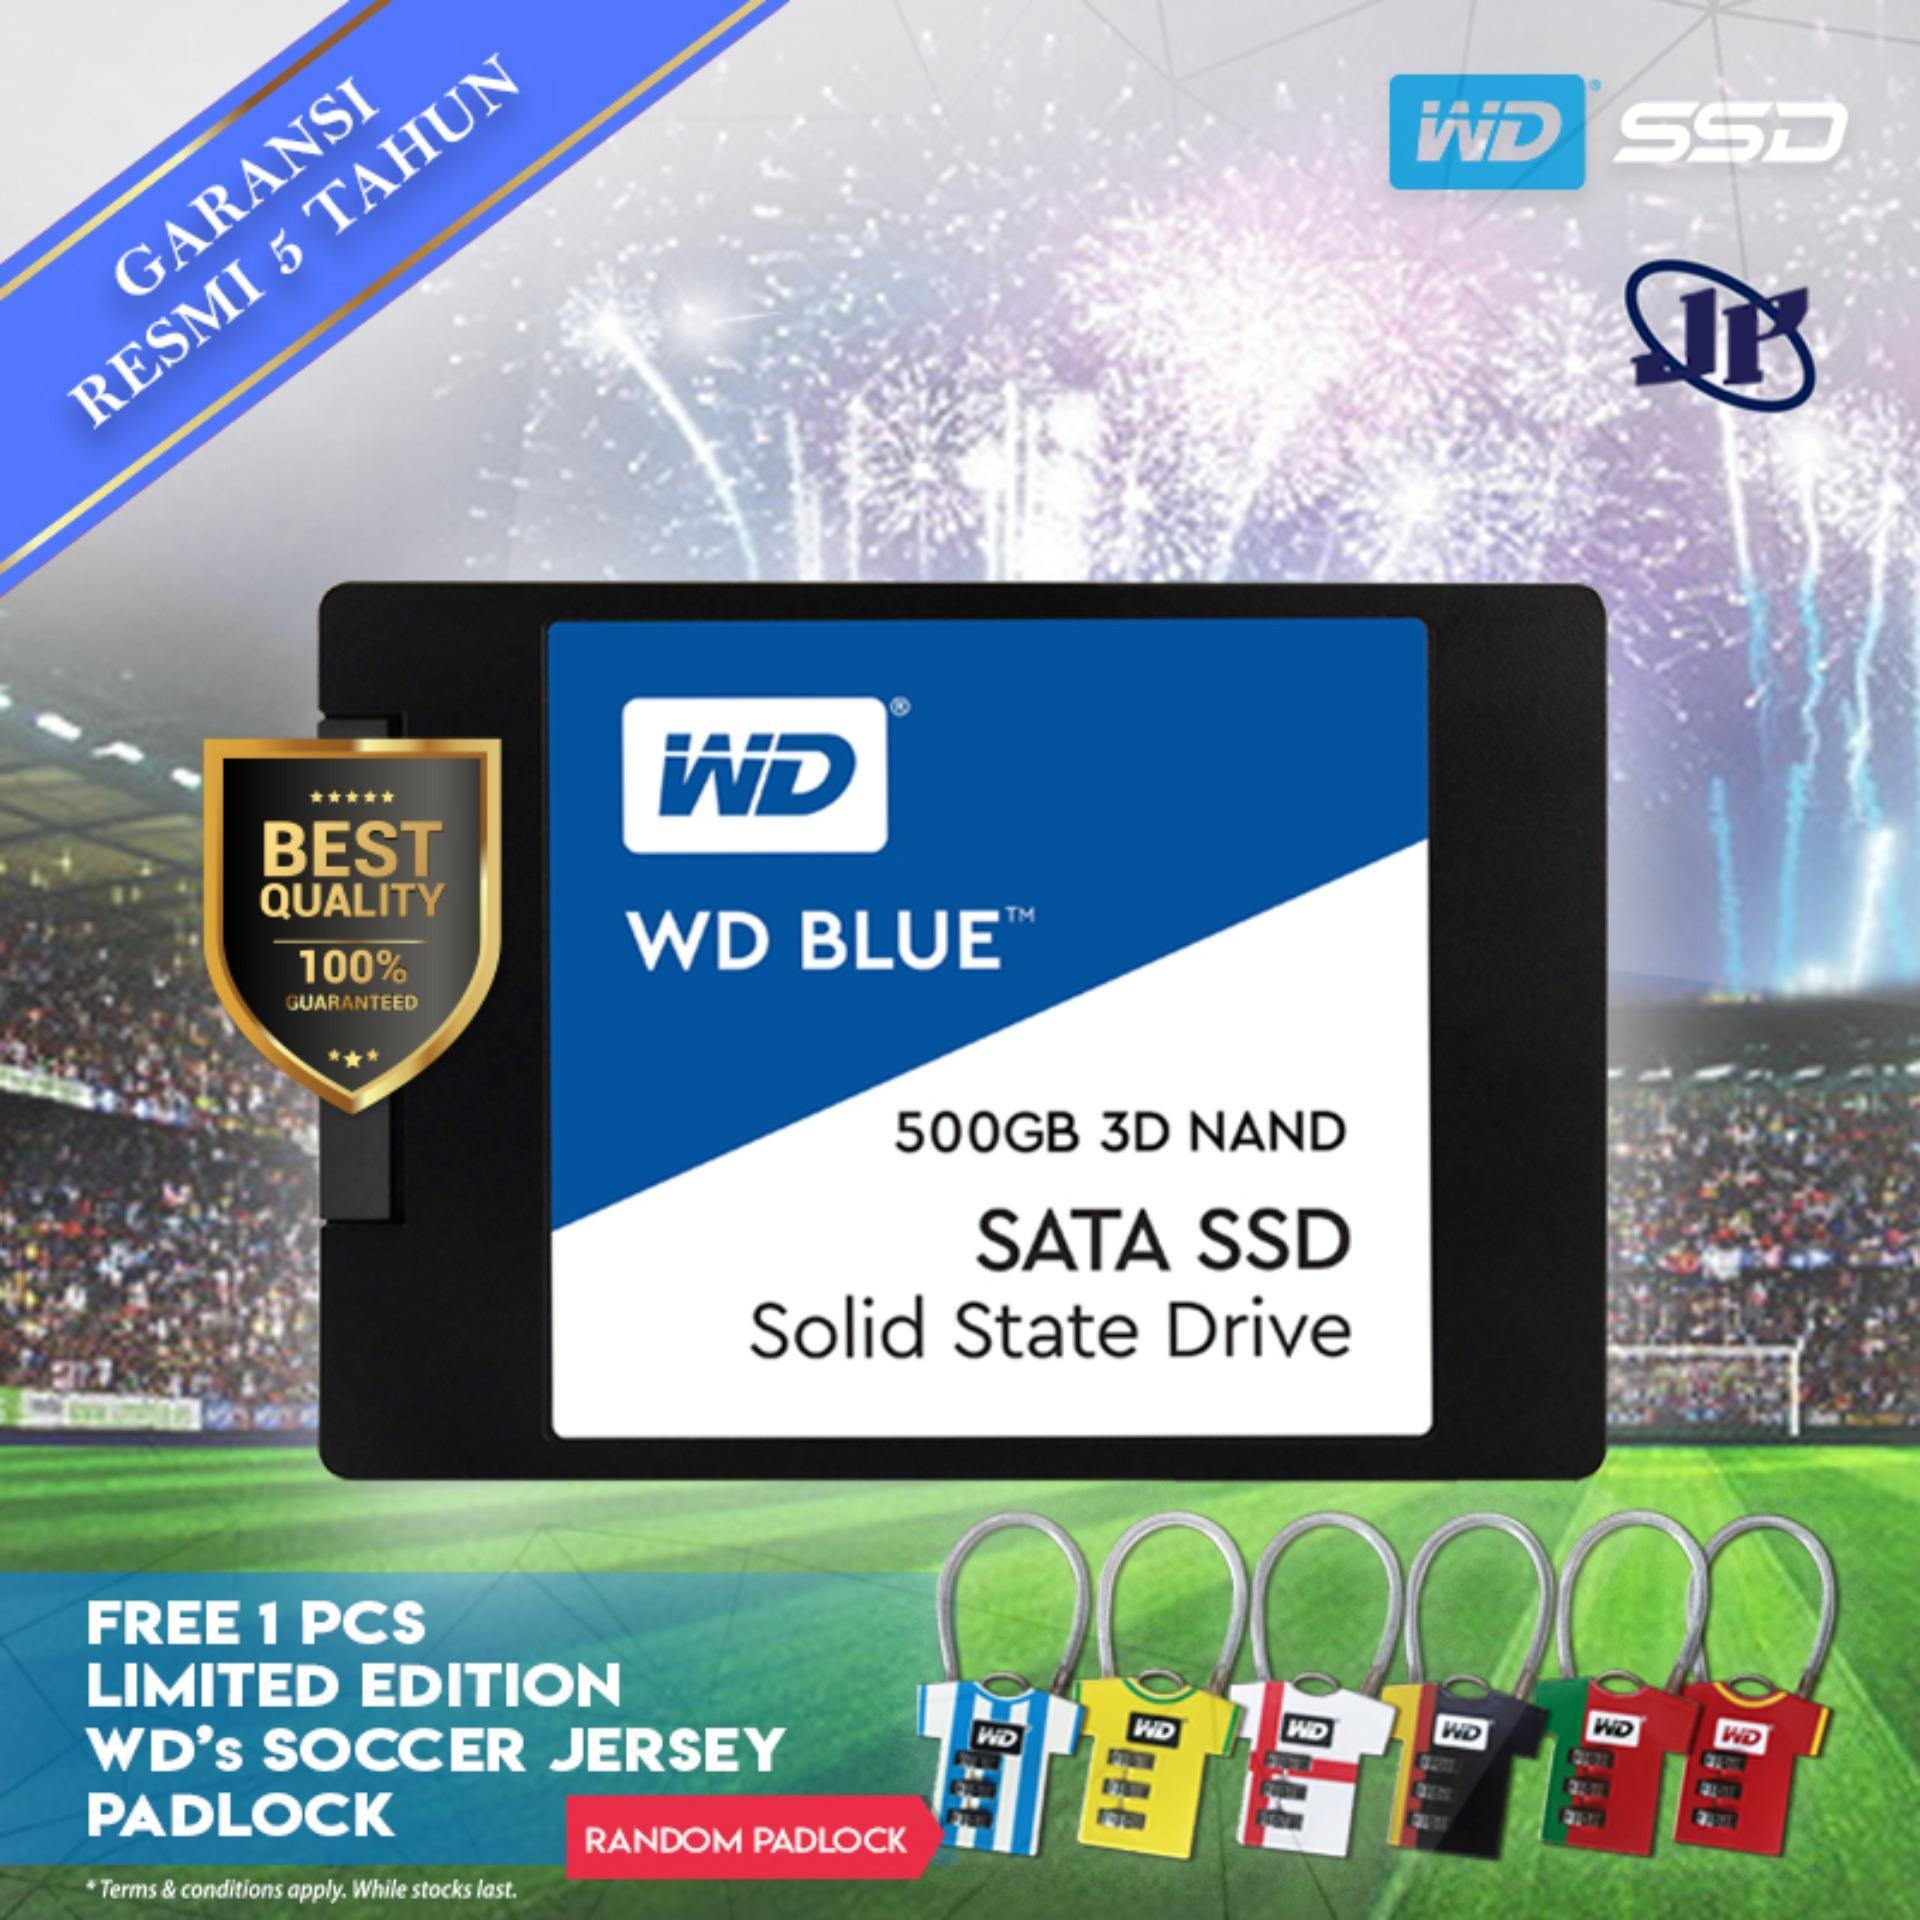 Western Digital WD Blue 3D Nand SSD 500GB 2.5